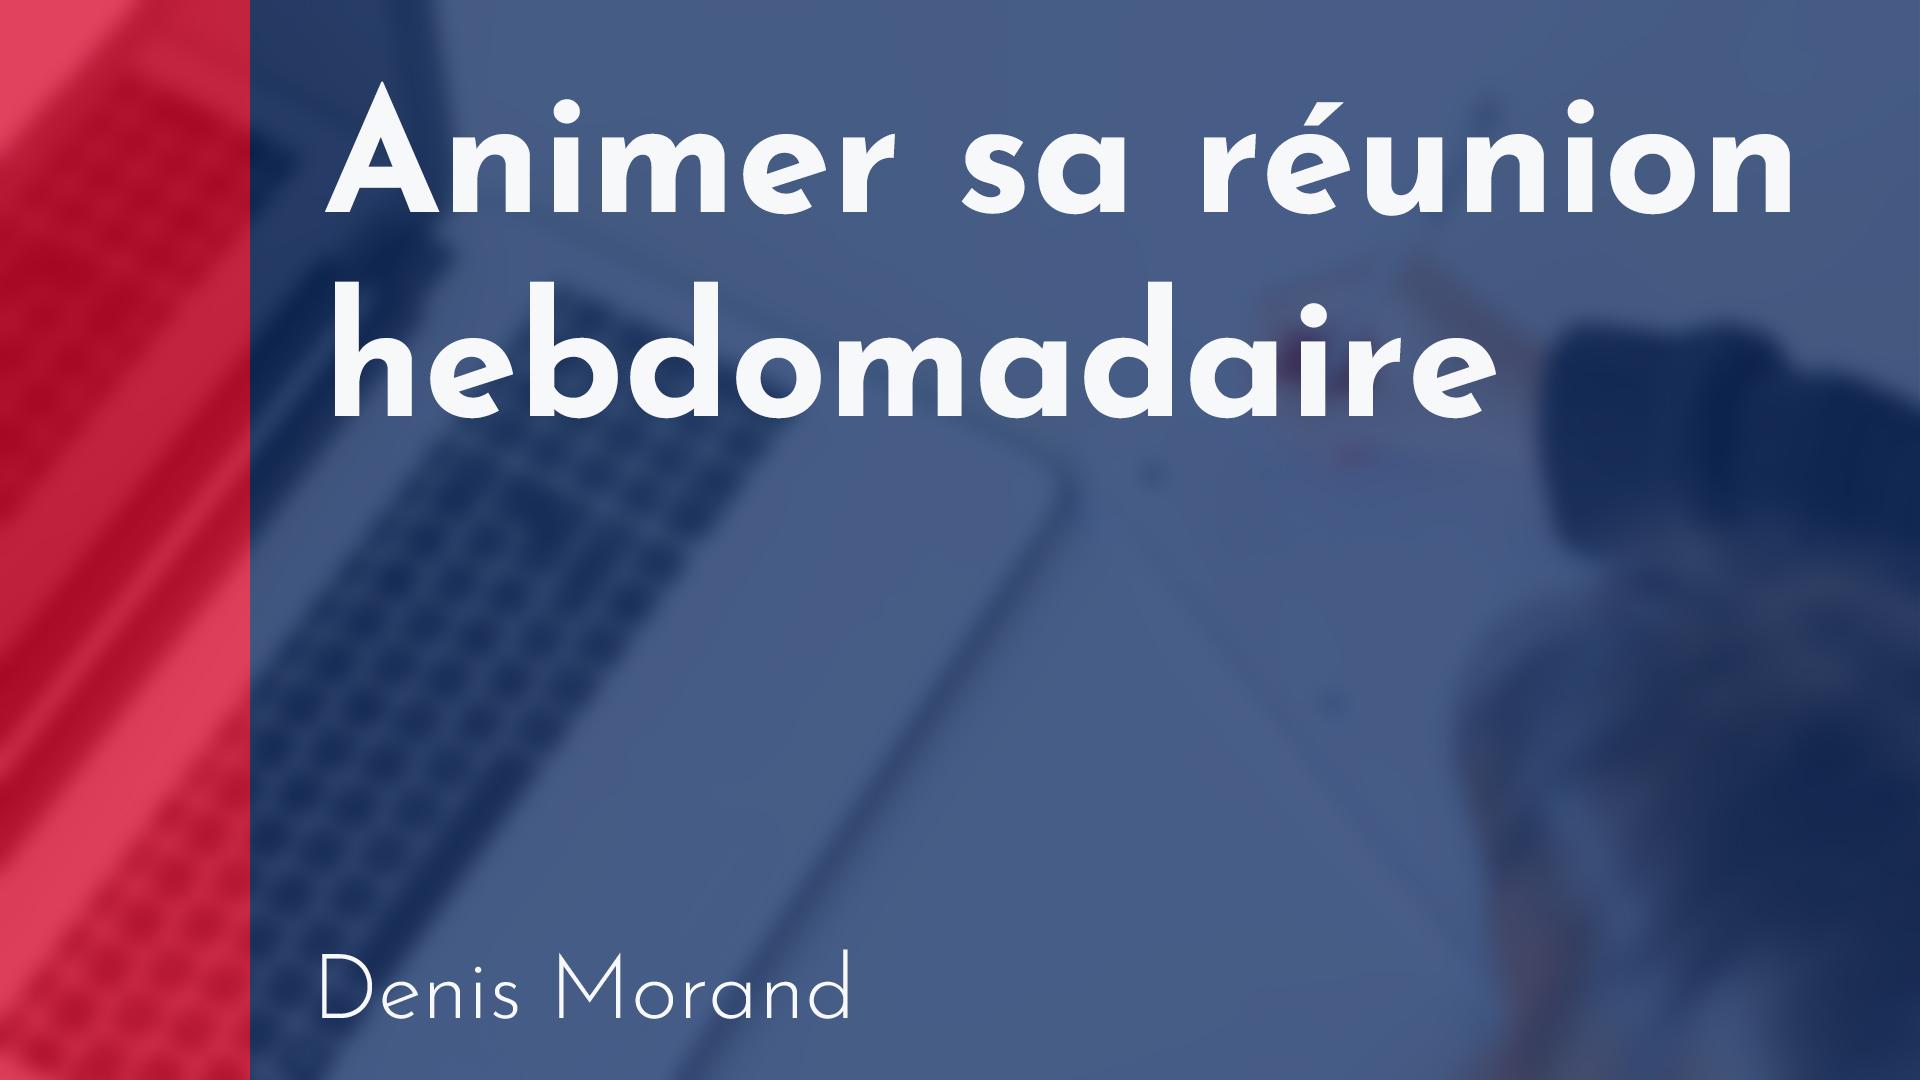 Transaction - Animer sa réunion hebdomadaire - Denis Morand